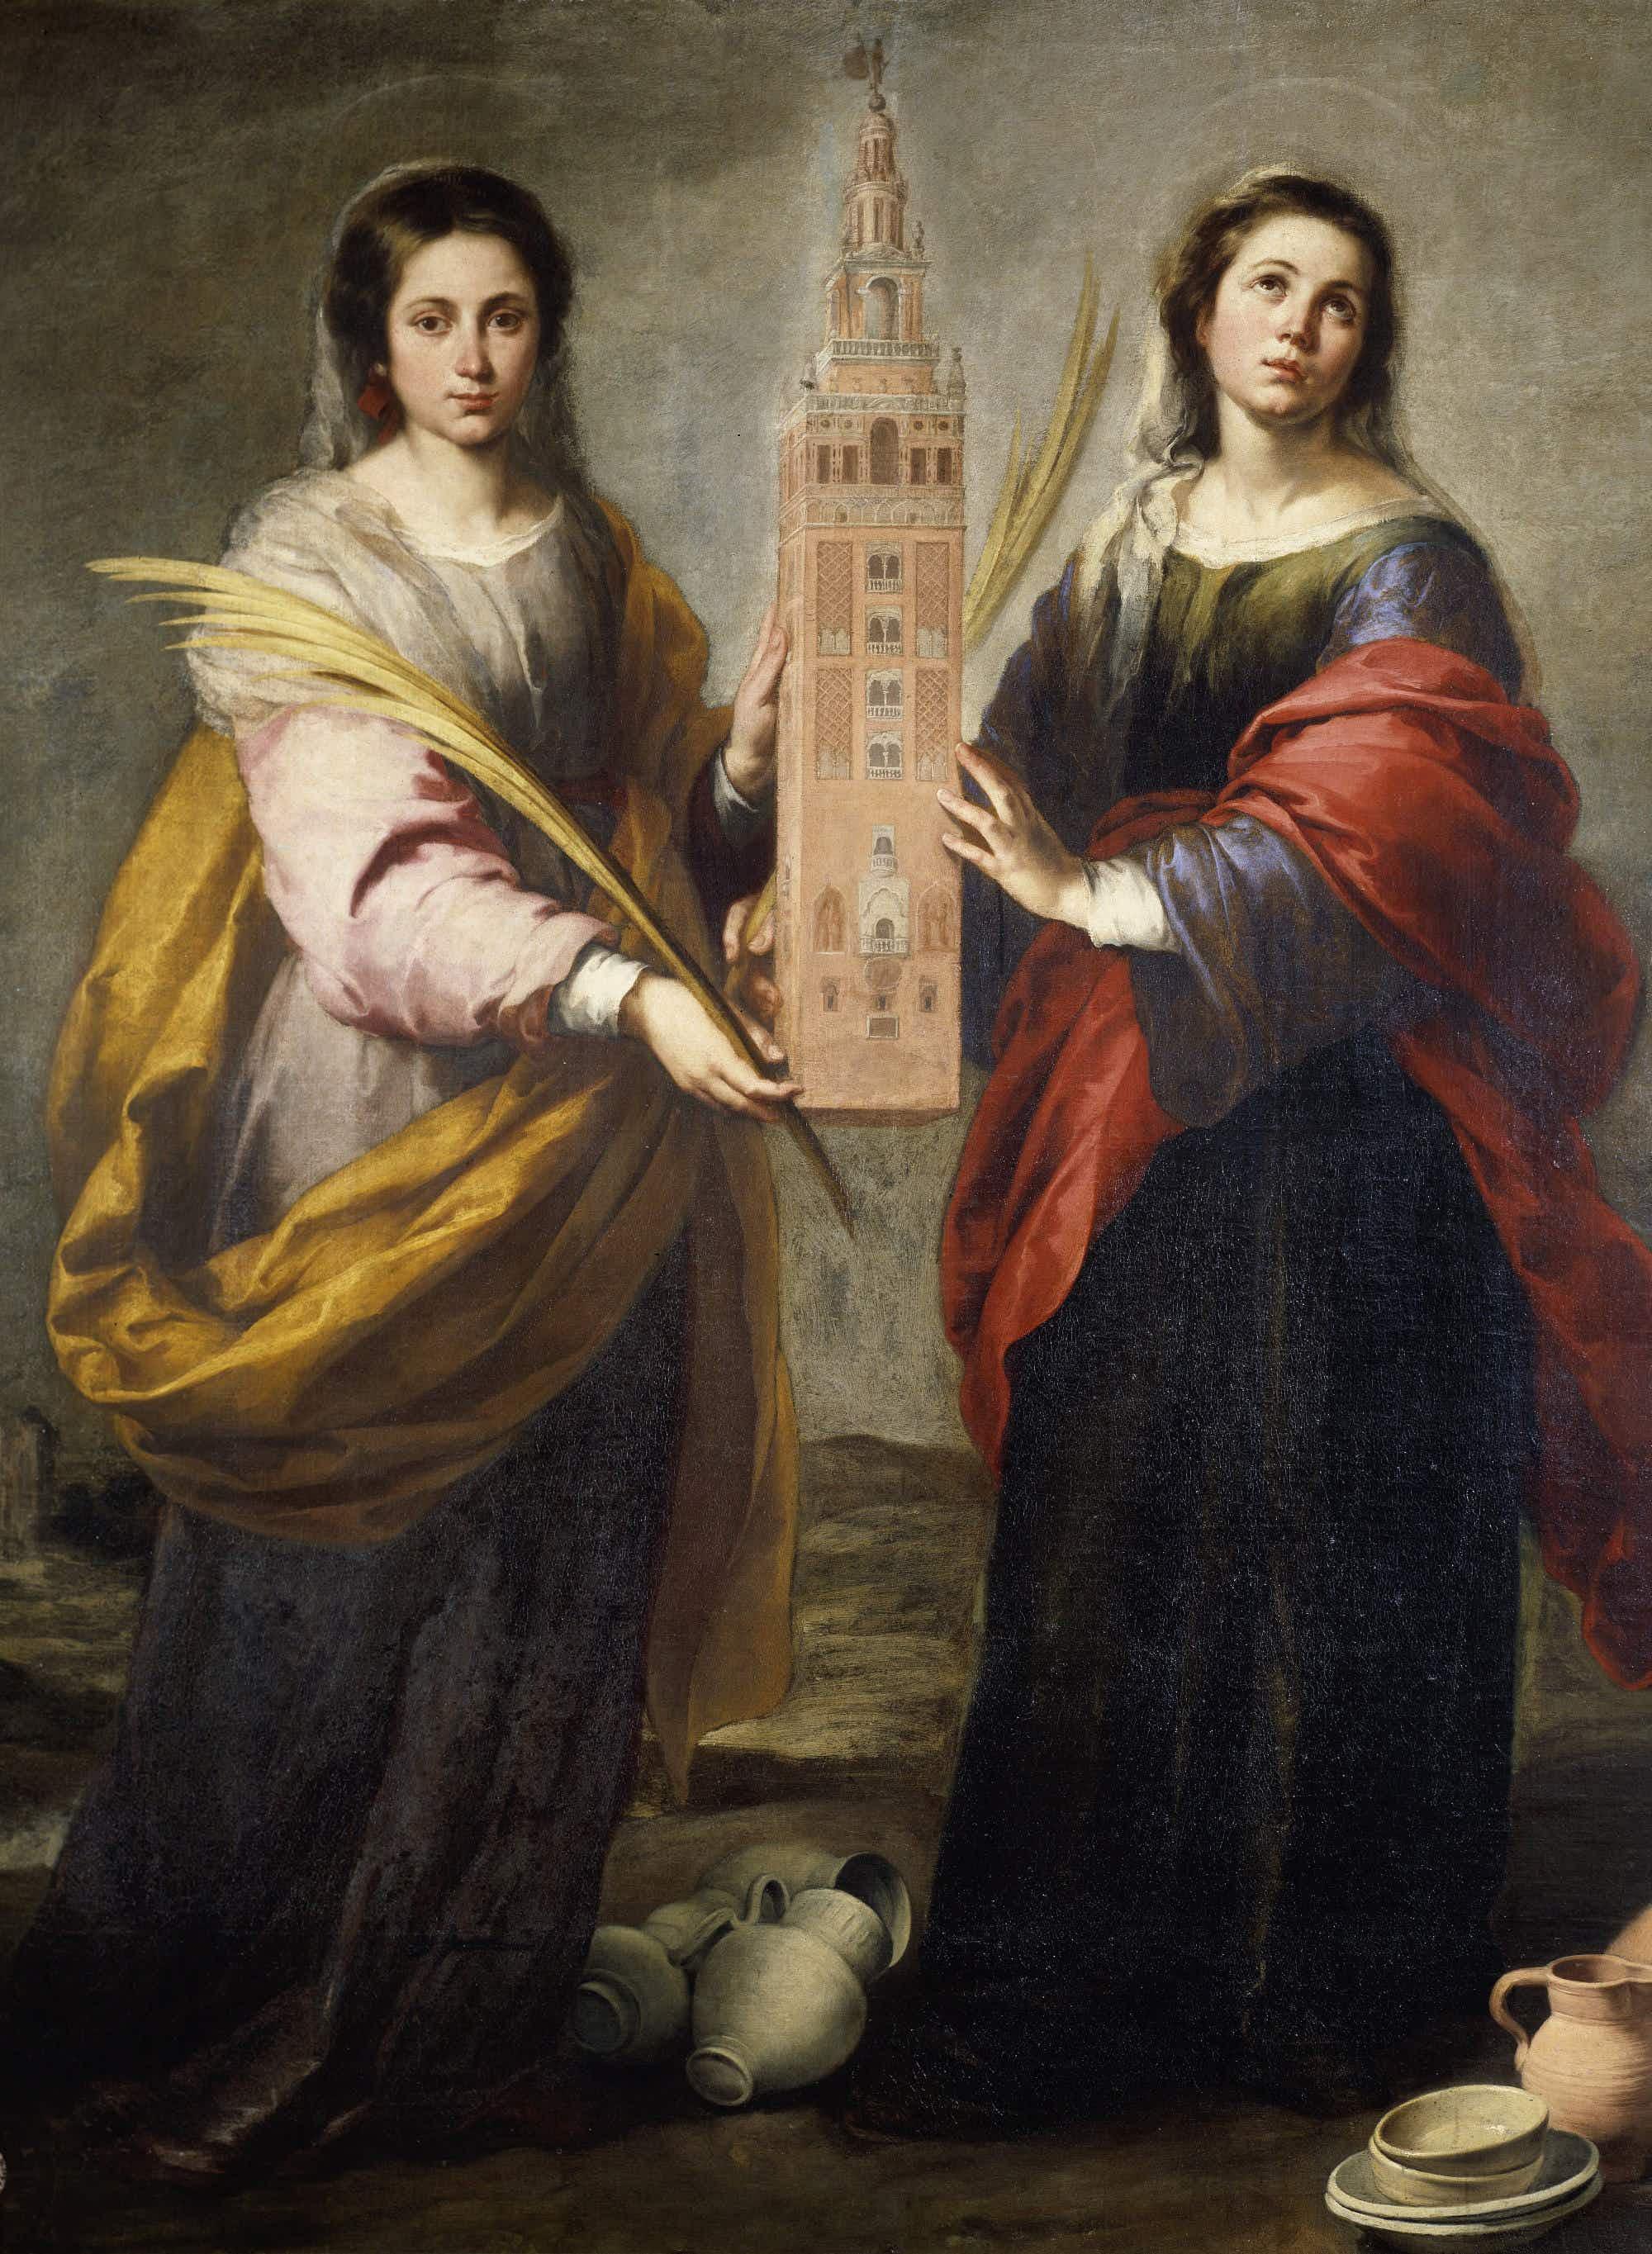 Seville celebrates Baroque painter's 400th anniversary